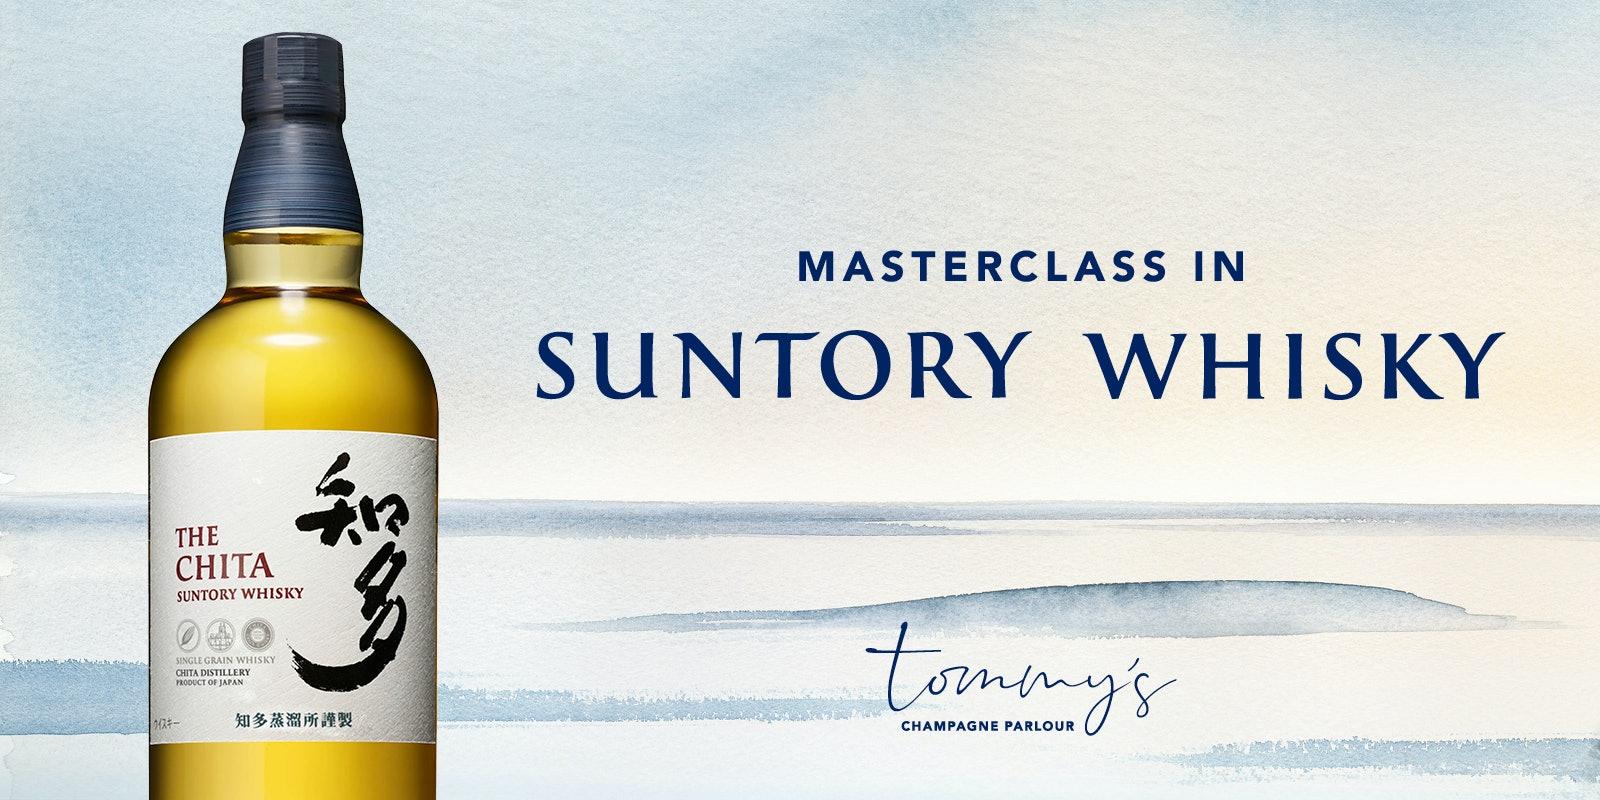 Masterclass in Suntory Whisky Distilleries